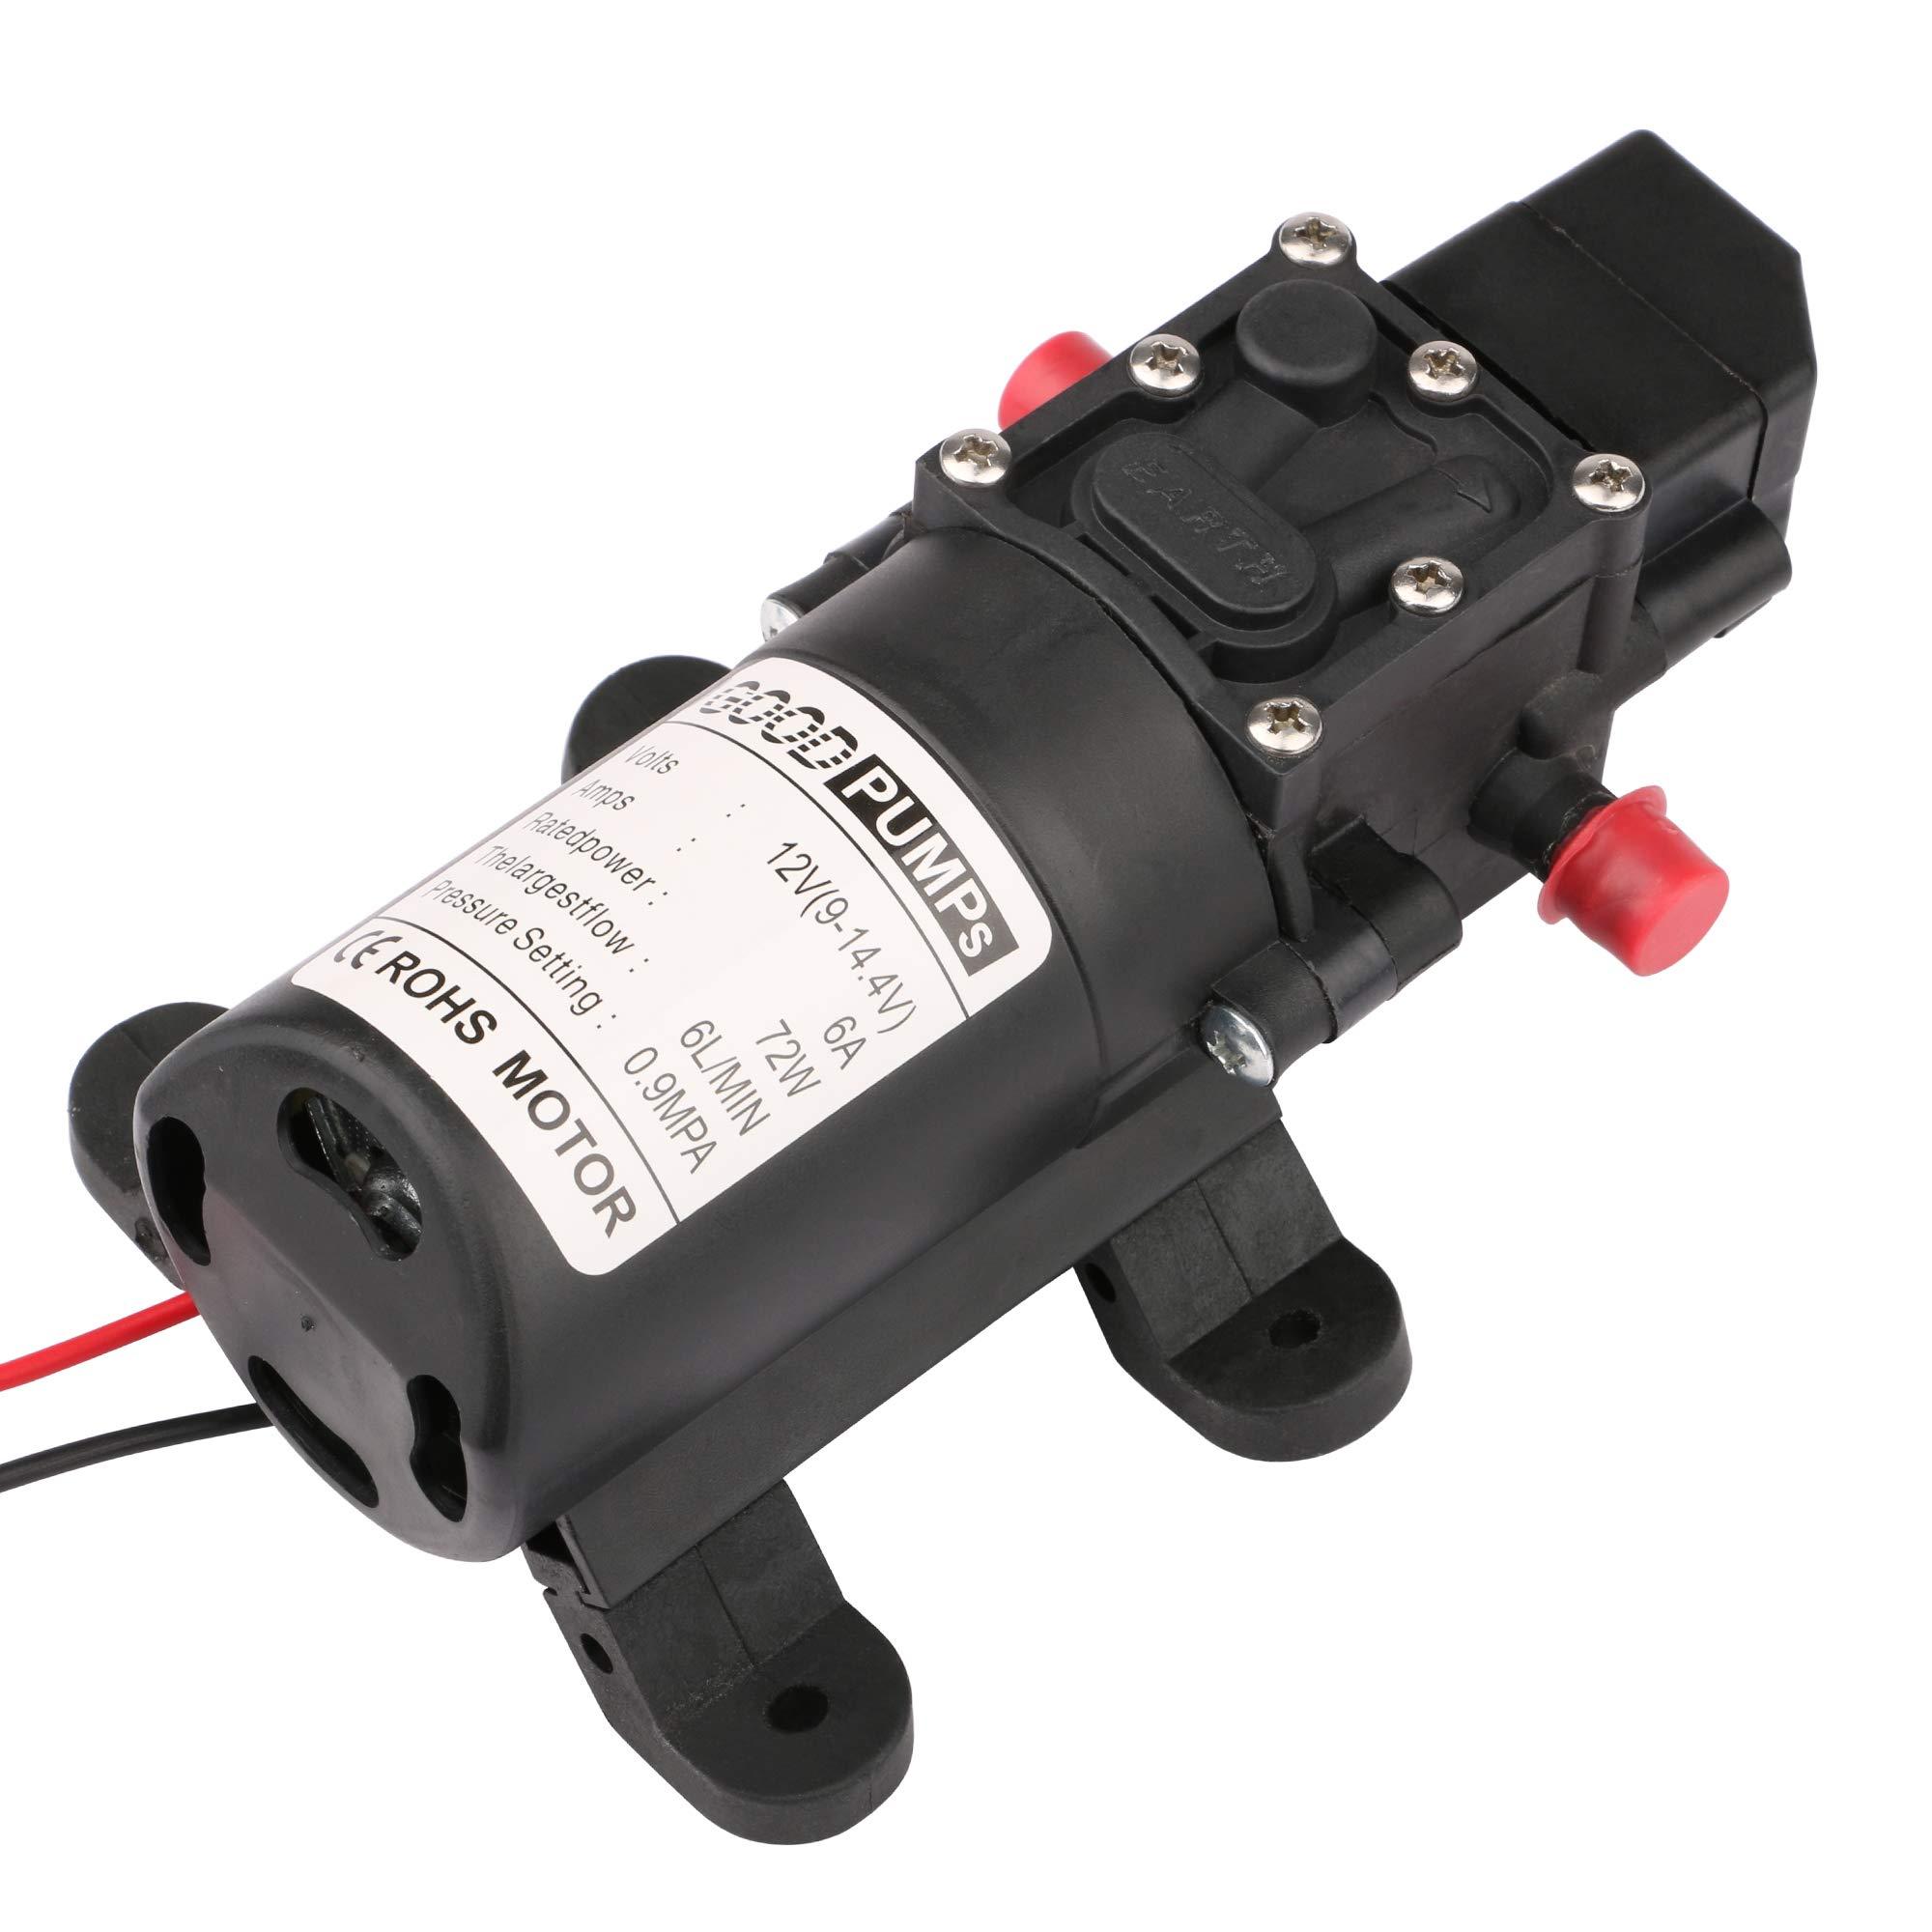 Driew Water Pressure Diaphragm Pump,12V DC Self Priming RV Fresh Water Diaphragm Booster Sprayer Pump Micropump for Garden/Car Washing/Caravan/ Boat/Marin